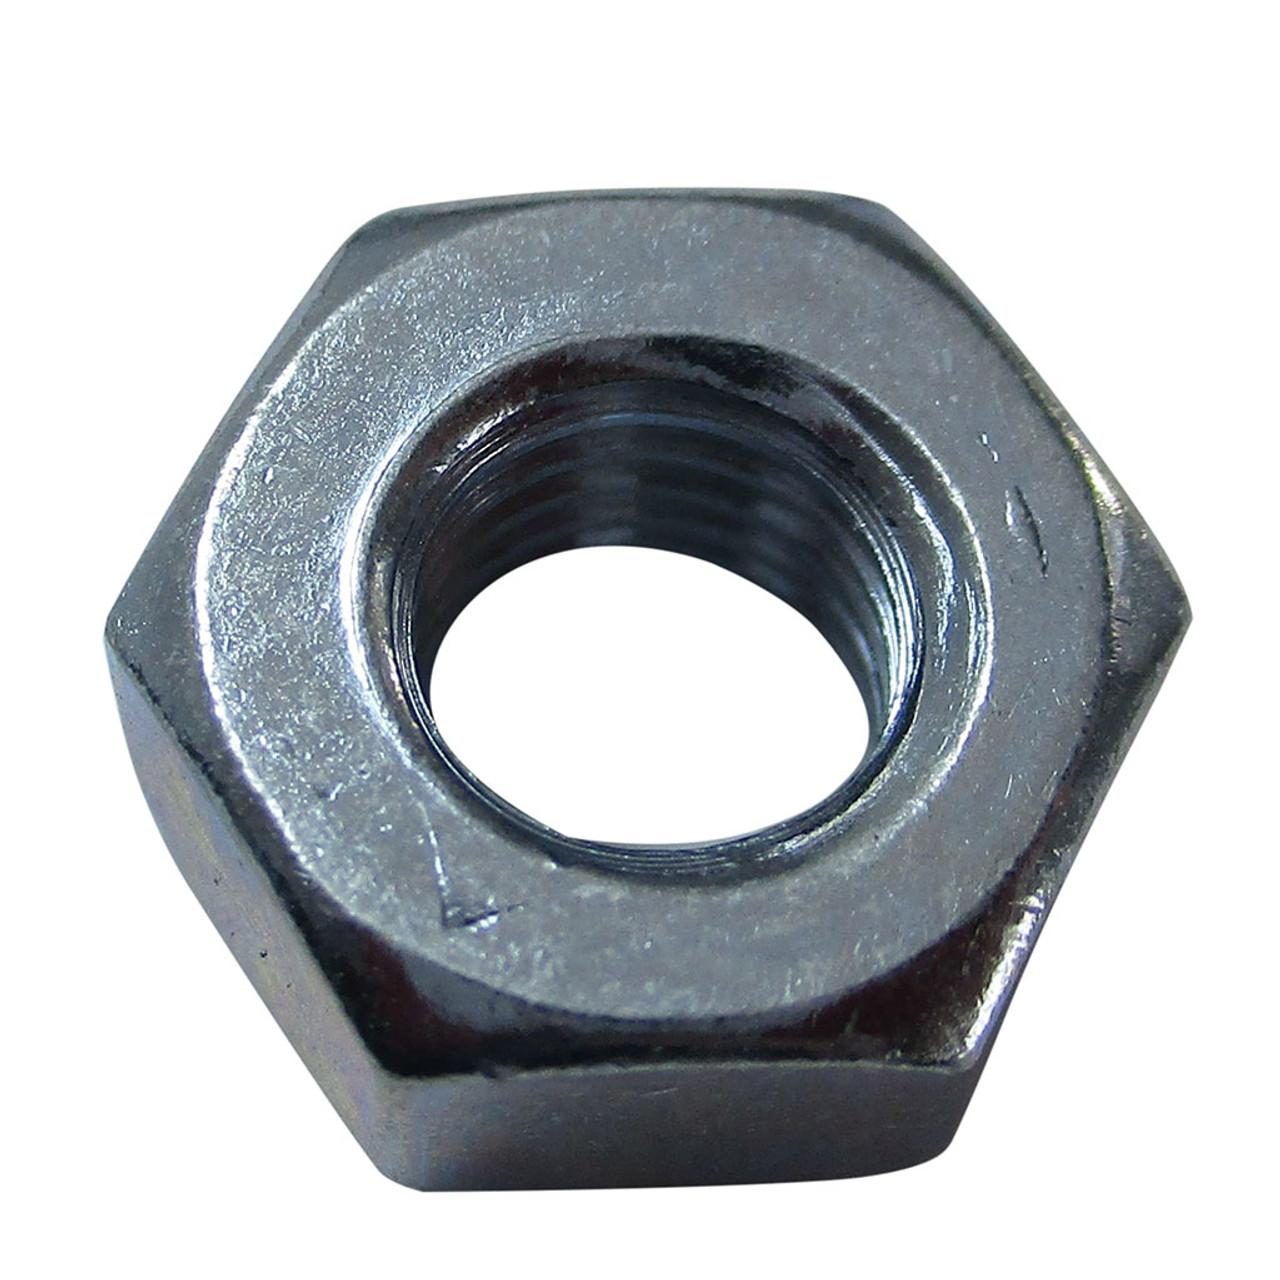 Hex Nut, 1/4-28, Zinc Plated